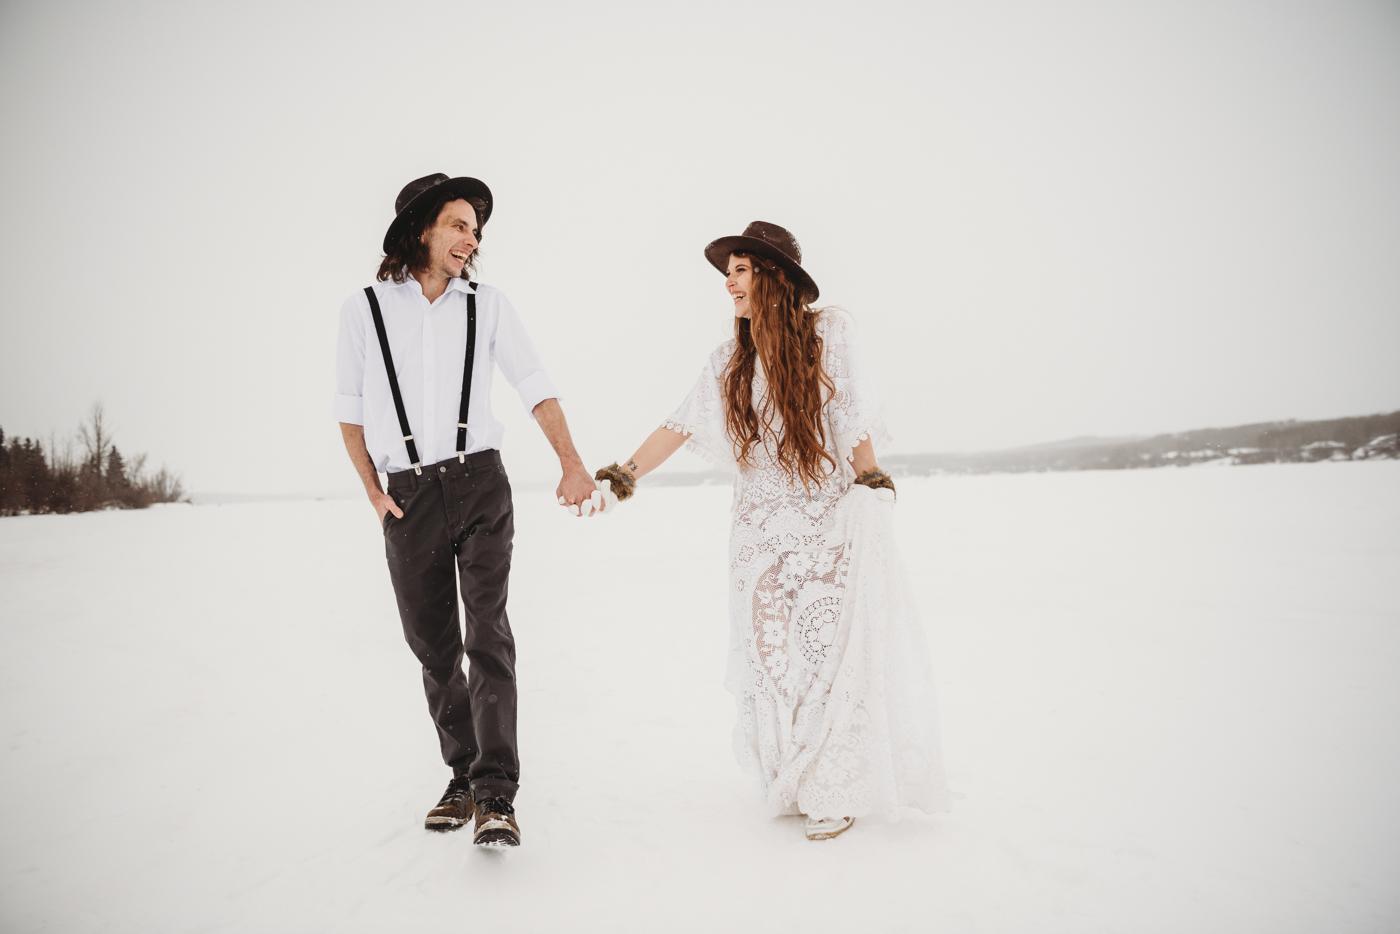 FortSt.John_photographer_TyraEPhotography_Wedding_Couple_Family_Photograhy_DawsonCreek_Elopement_Bride_Boduoir_Portraits-5013.jpg